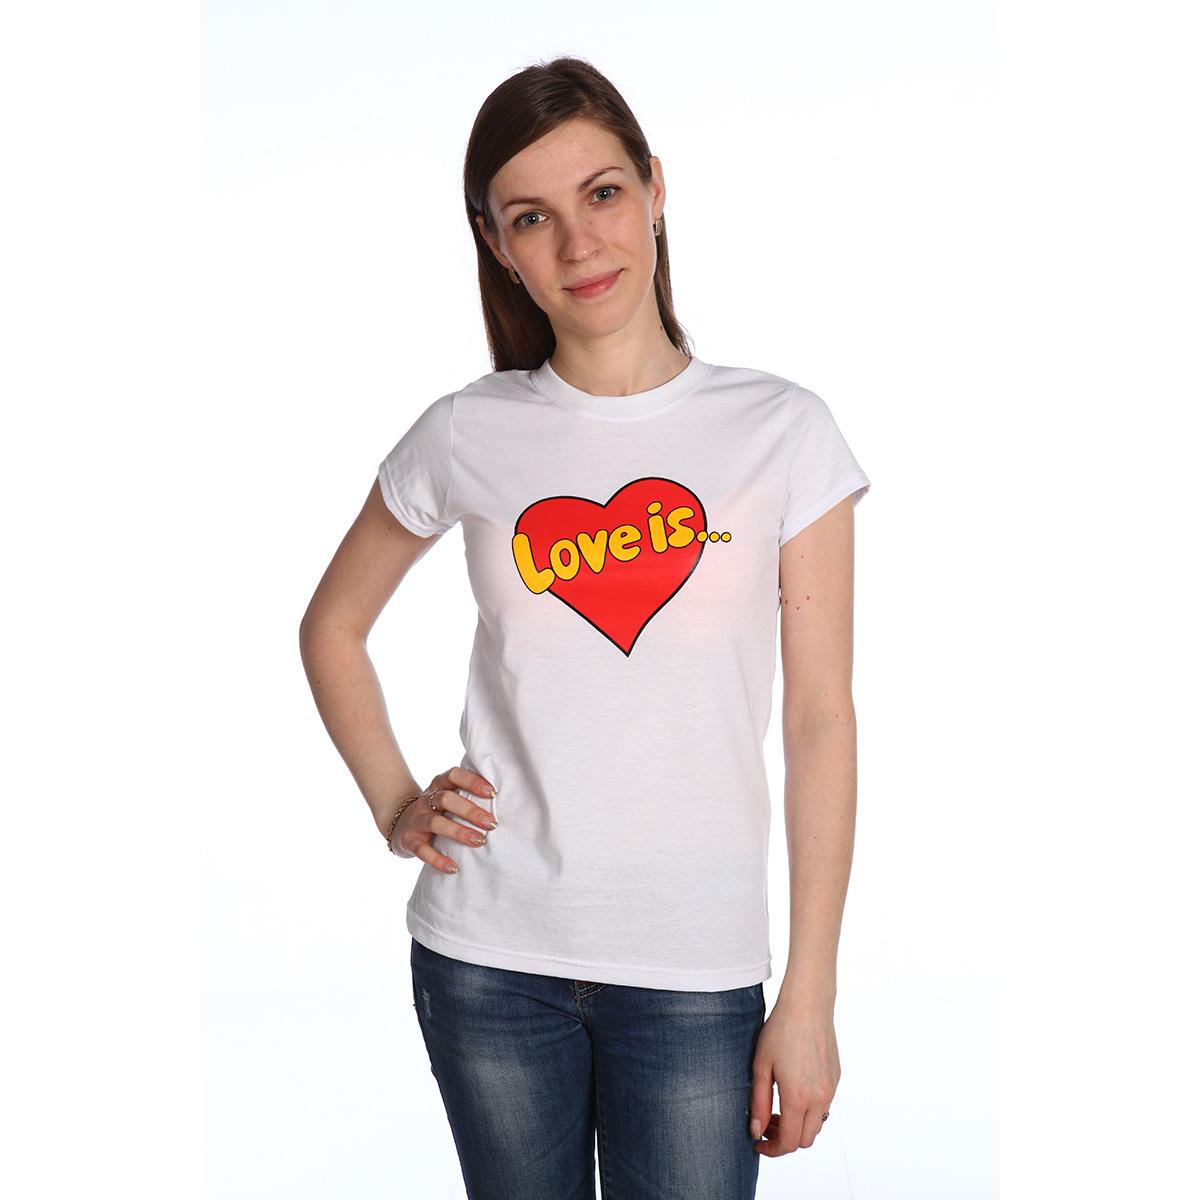 Женская футболка Love is Белый, размер LБлузки, майки, кофты<br>Обхват груди:96 см<br>Обхват талии:77 см<br>Обхват бедер:104 см<br>Рост:164-170 см<br><br>Тип: Жен. футболка<br>Размер: L<br>Материал: Кулирка